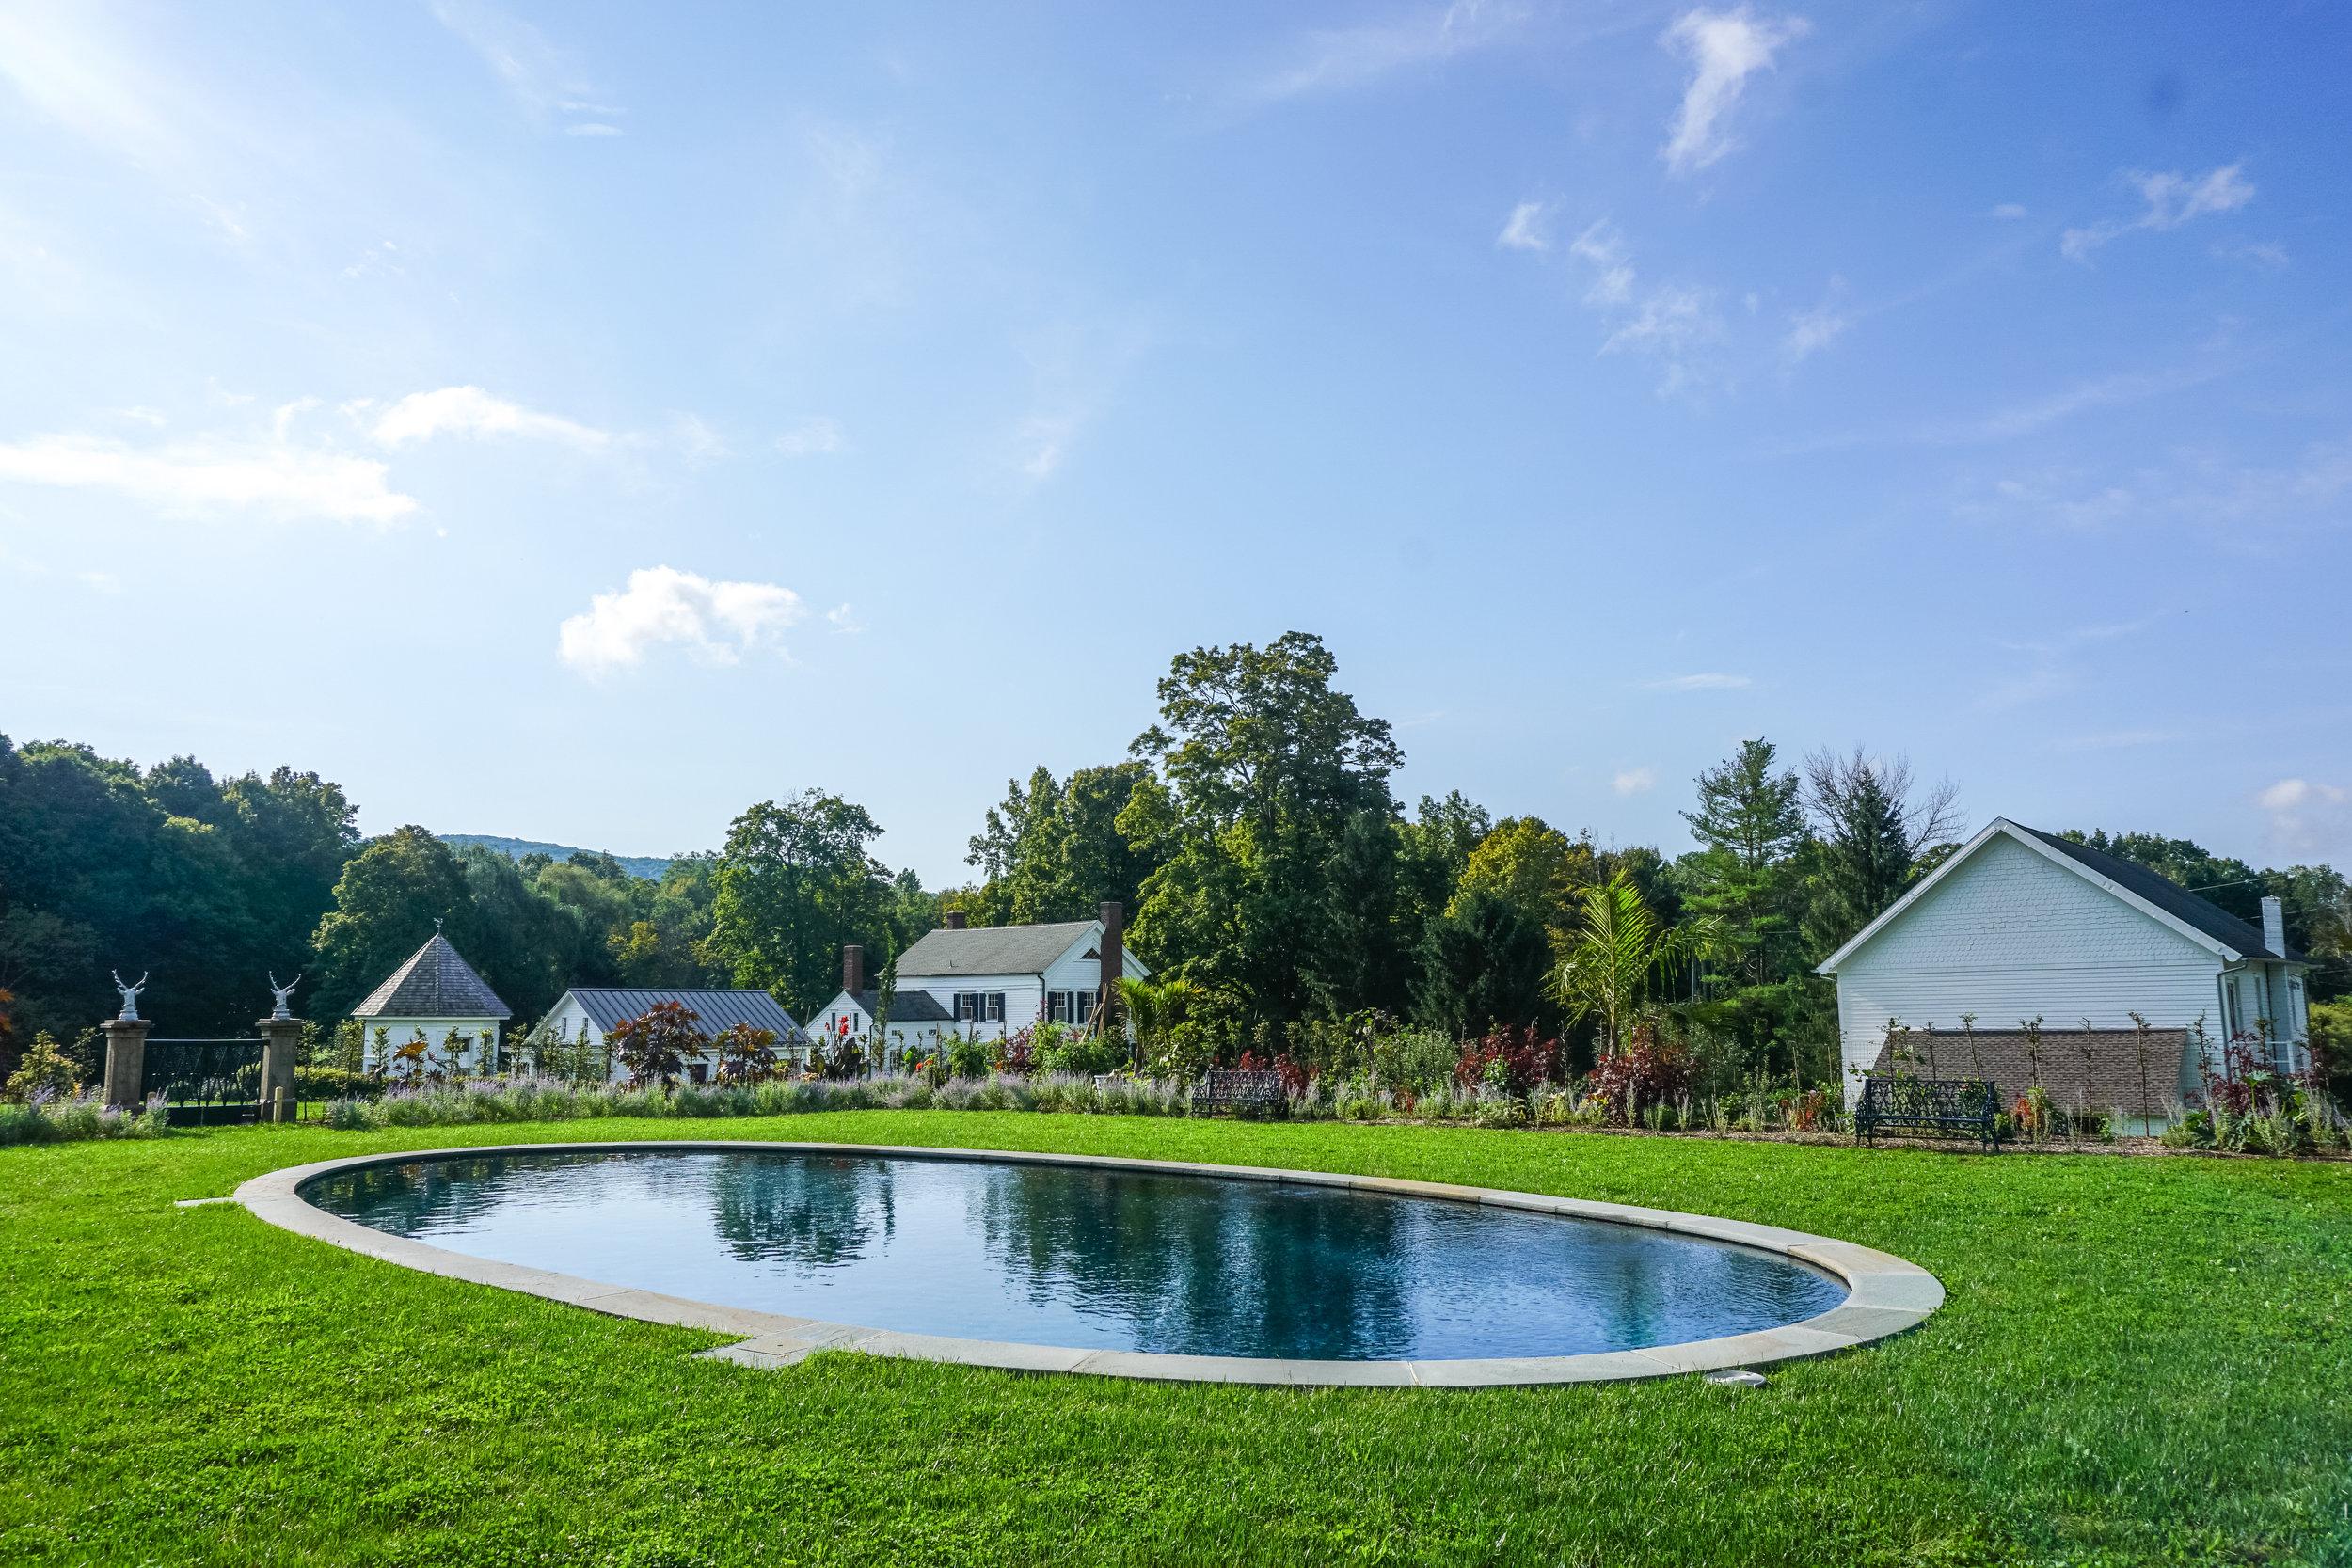 In-ground custom gunite oval swimming pool